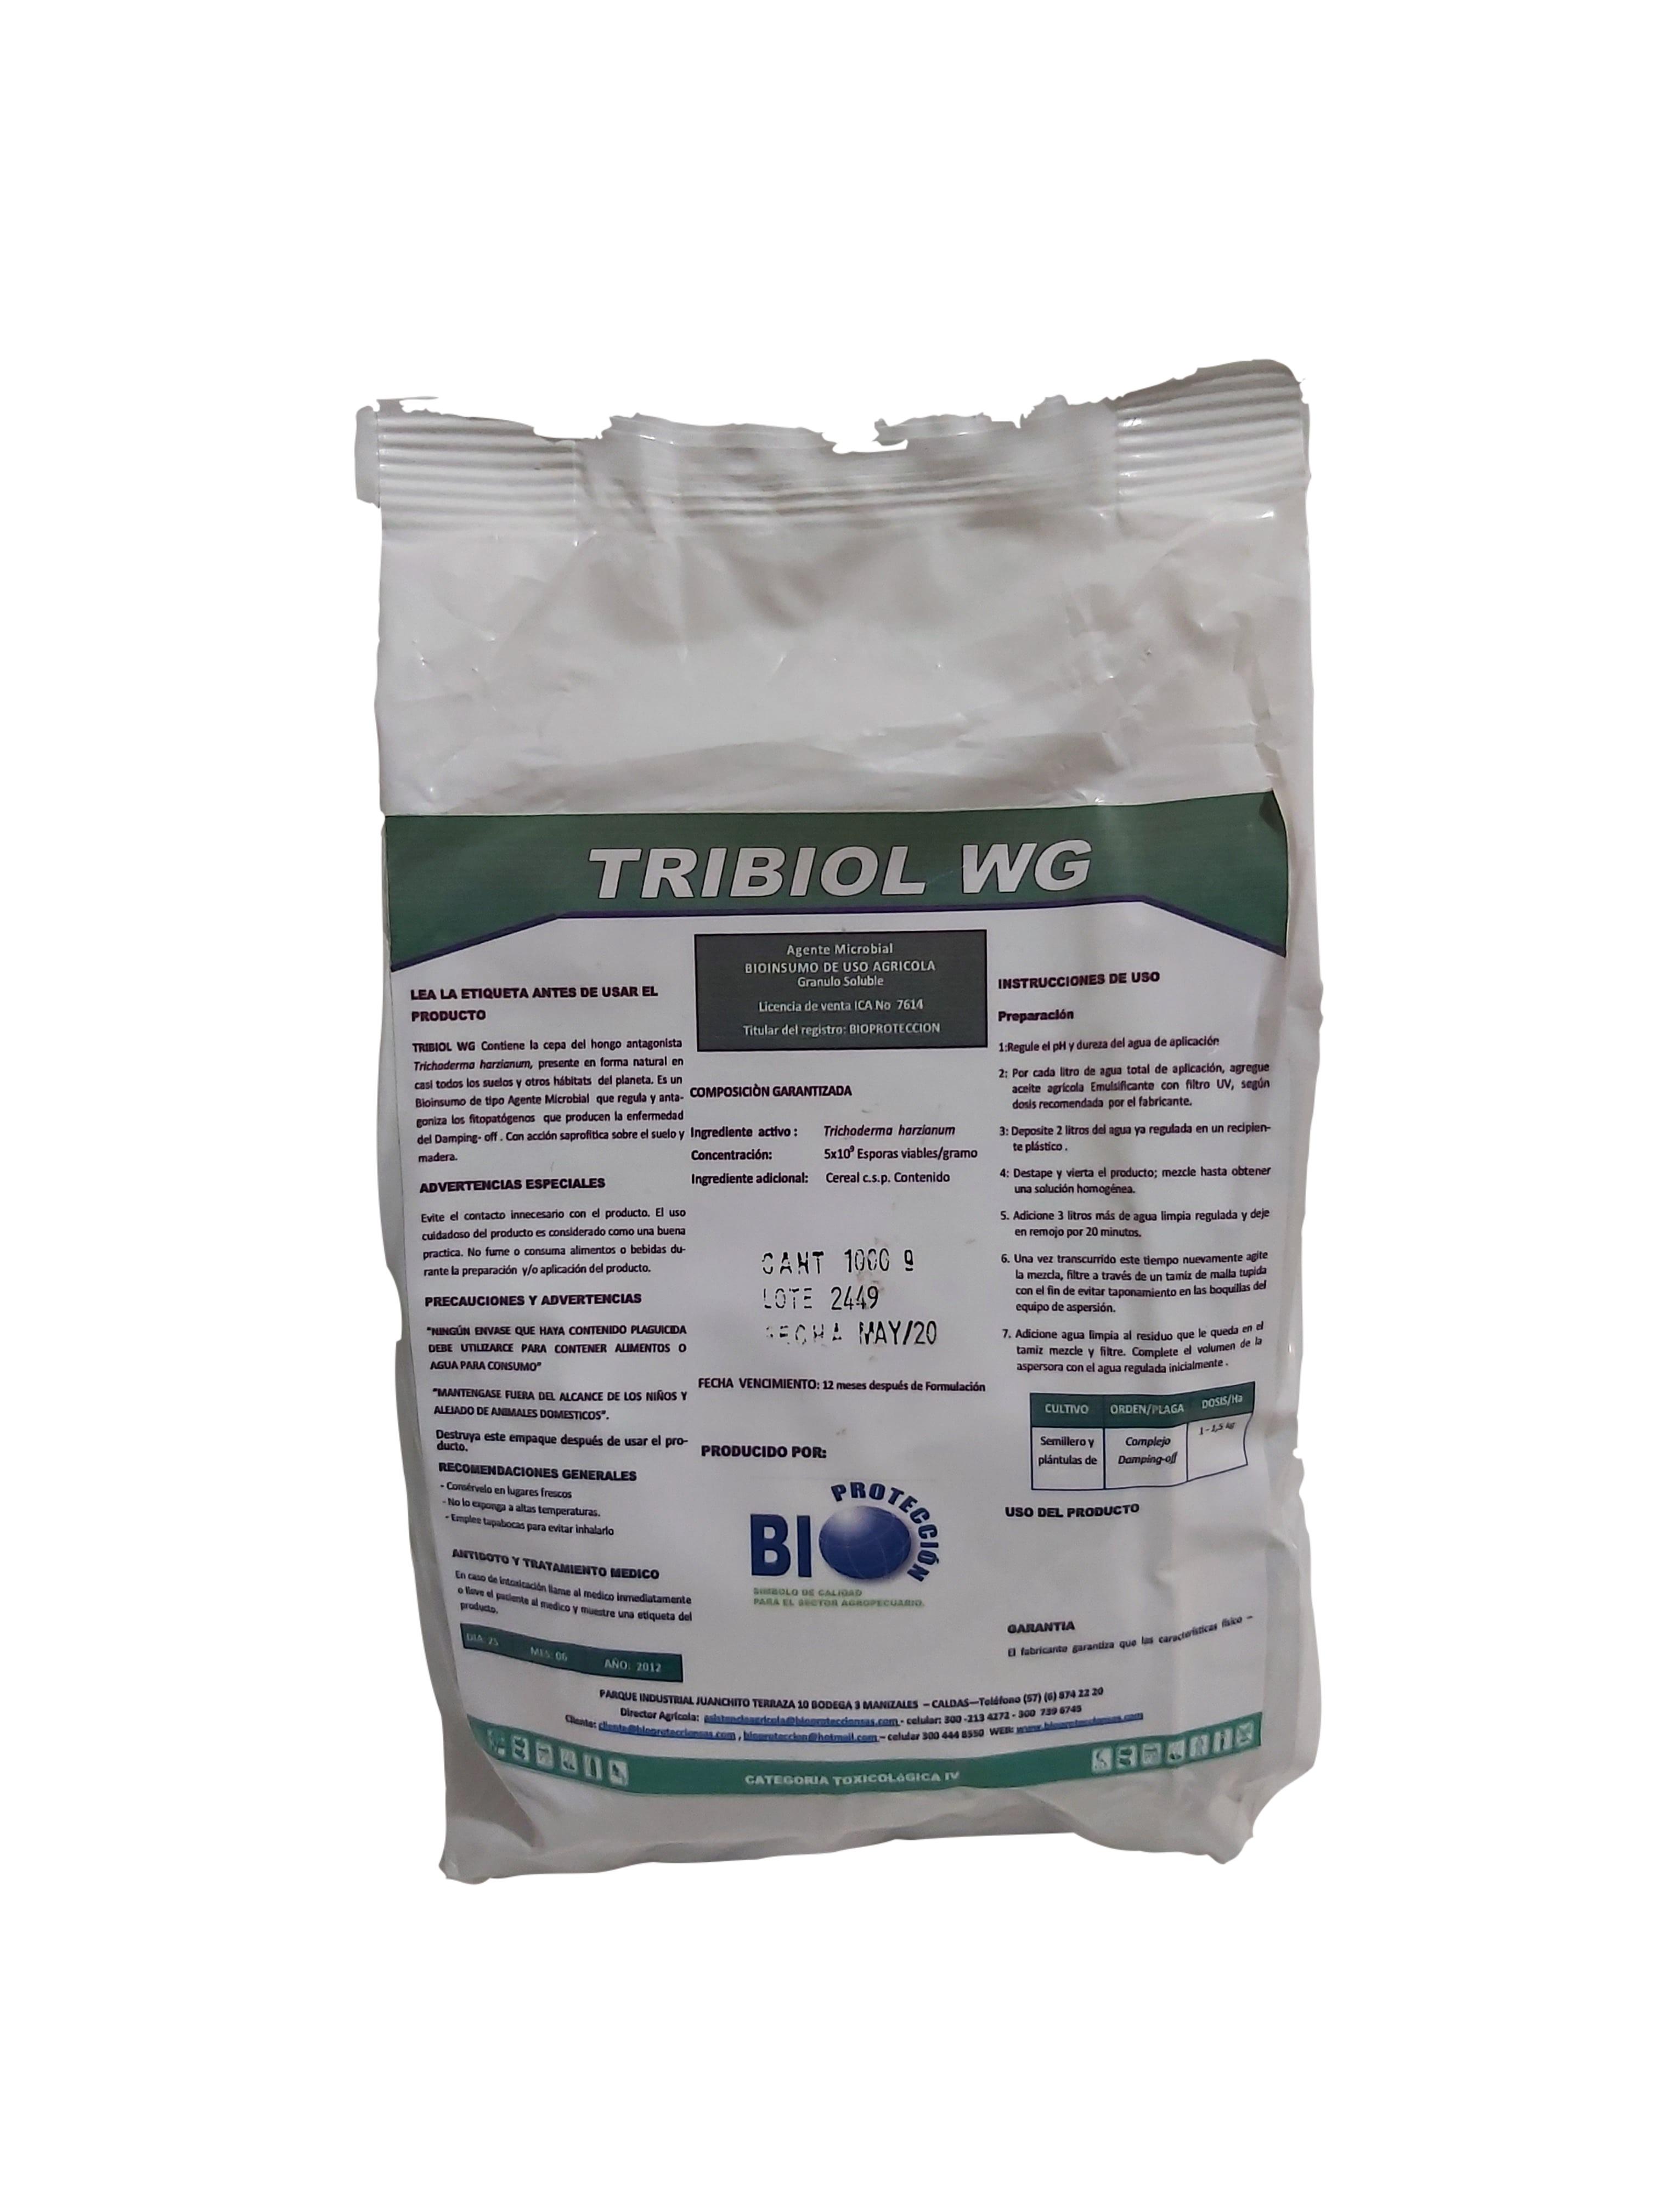 Bioregulador-Tribiol-(Trichoderma)-Bioglobal-Agrosync.jpg